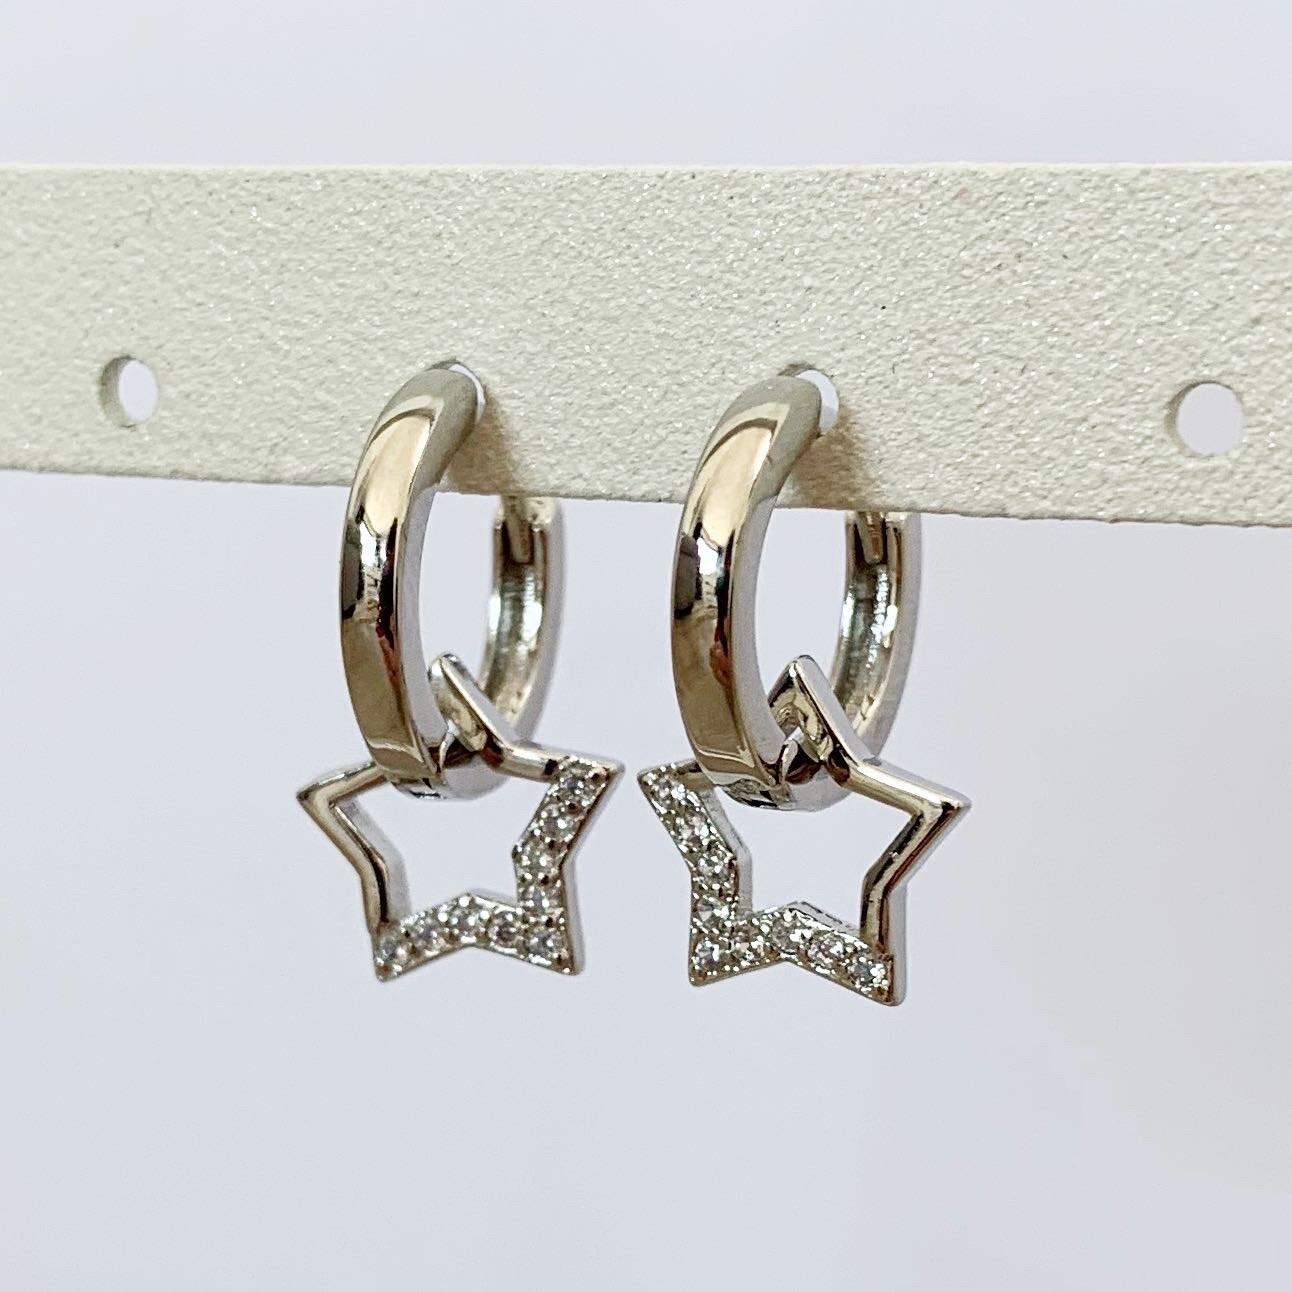 Oorringetjes met hangende ster 925 sterling zilver